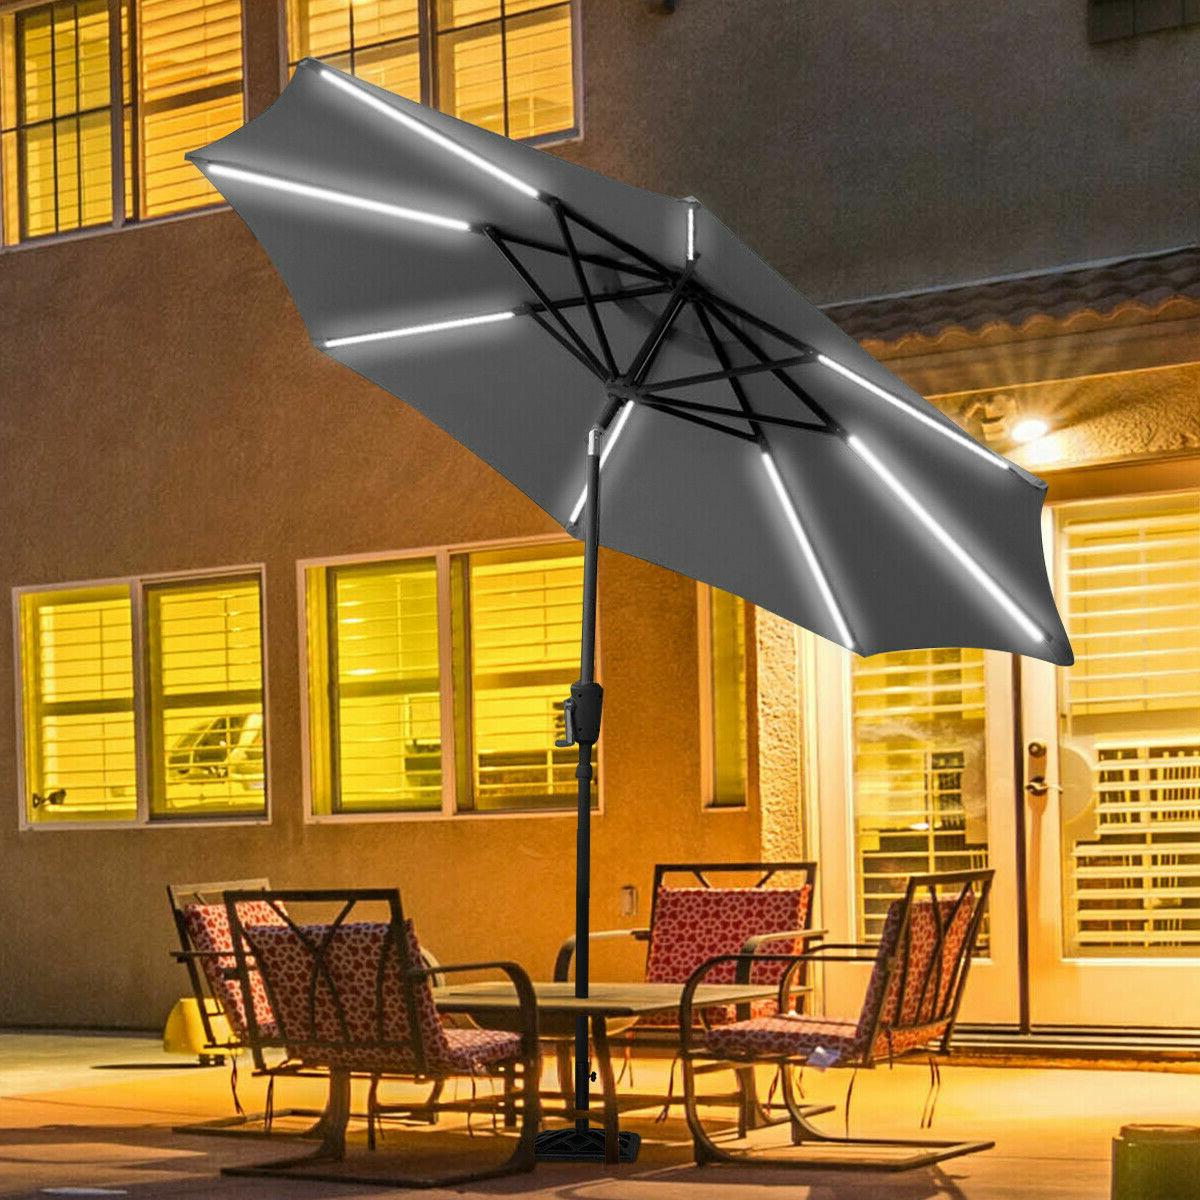 Most Recent Sinclair 9' Patio Led Light Market Umbrella With Regard To Annabelle Market Umbrellas (View 15 of 20)